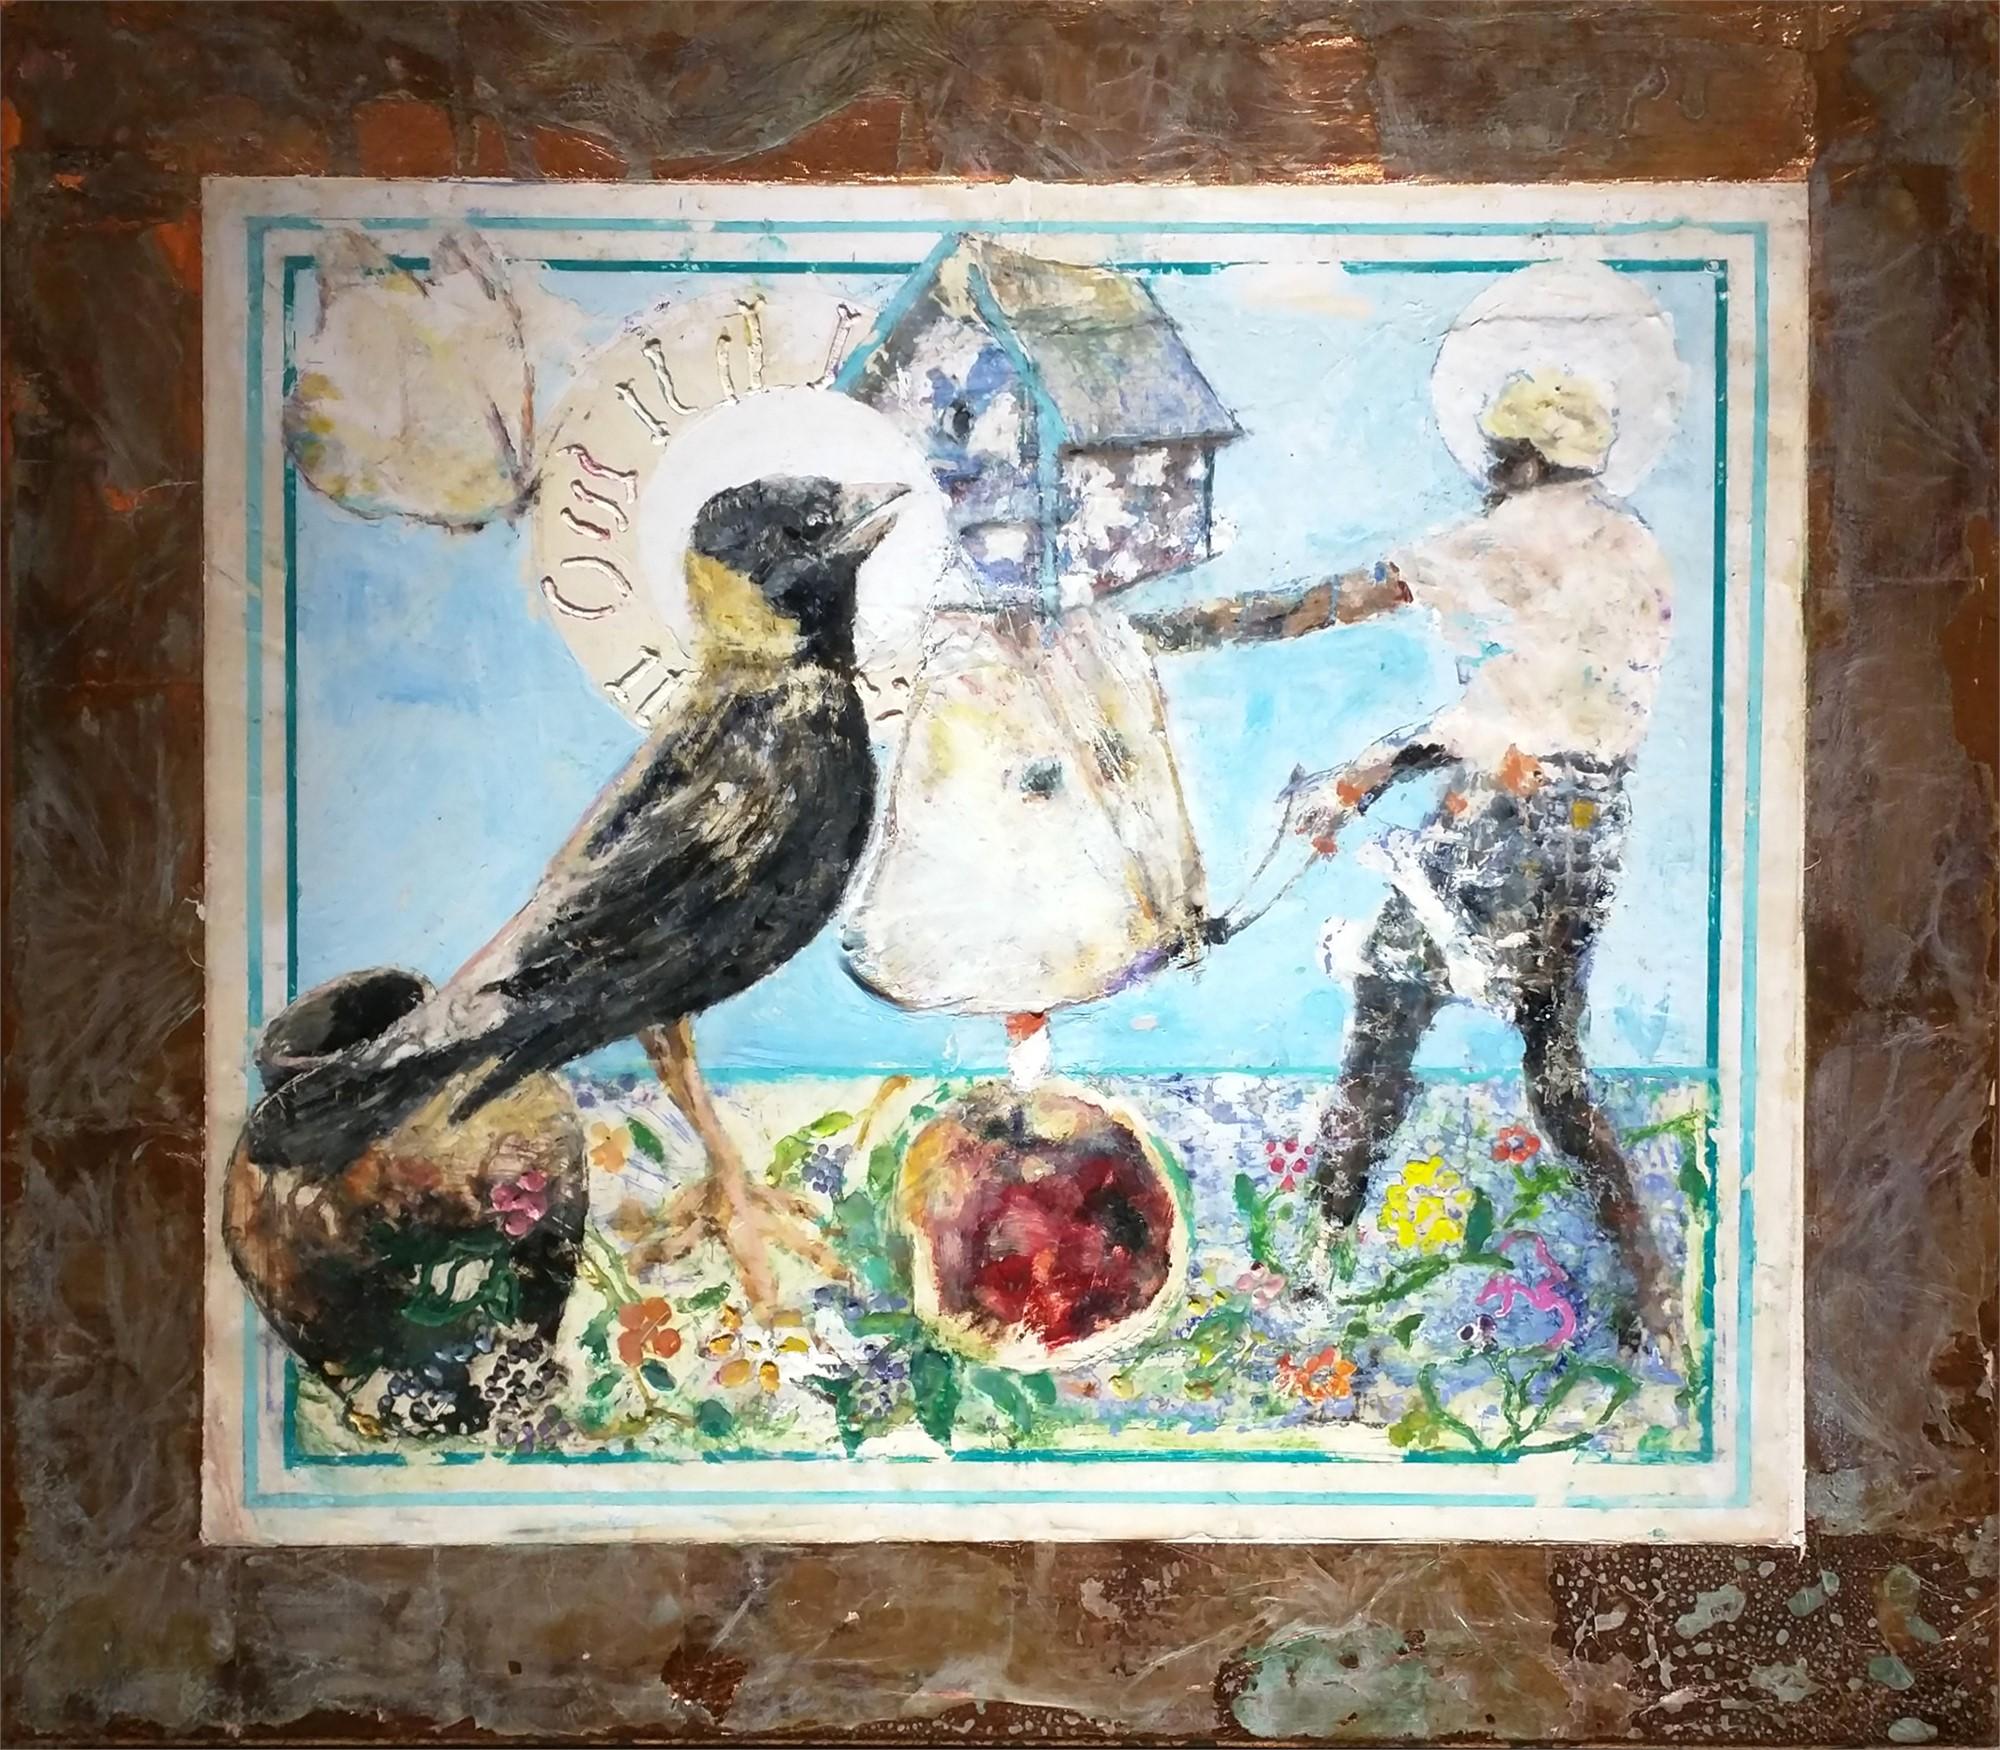 Still Life for Bird Temple #9 by Mark Gaskin